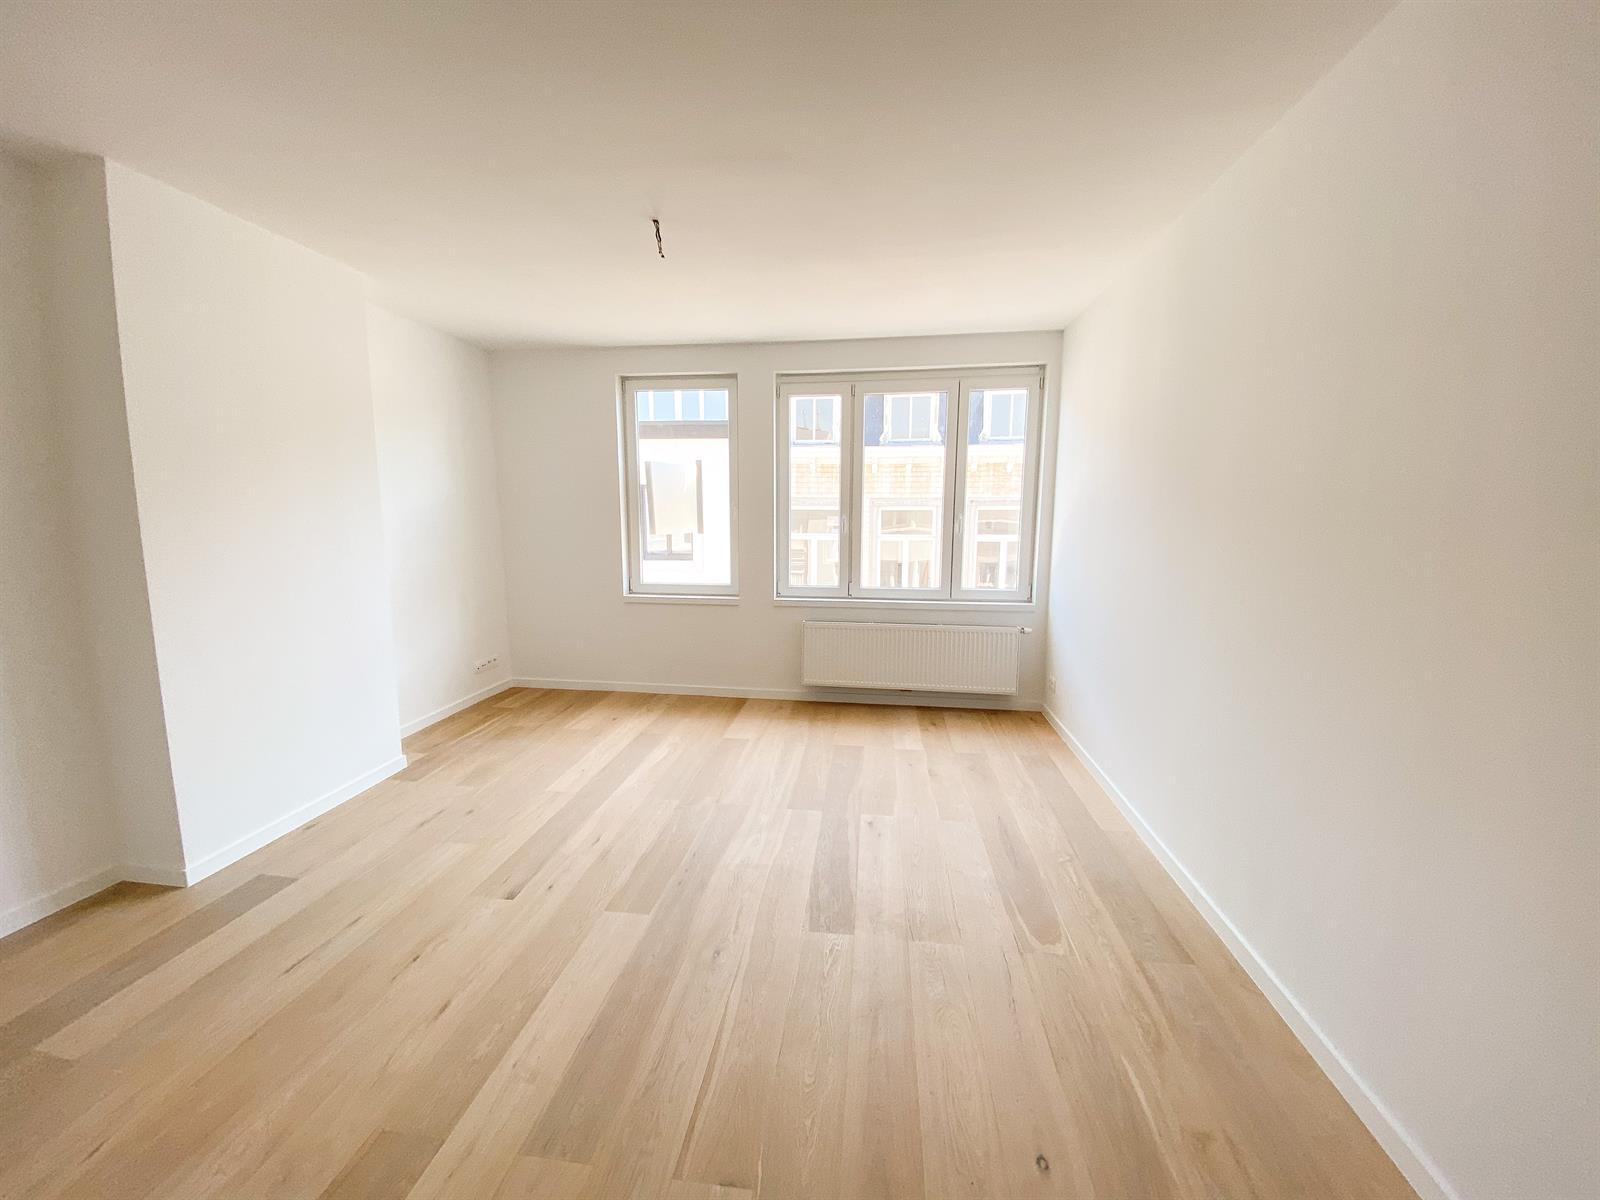 Appartement - Liège - #4045823-4